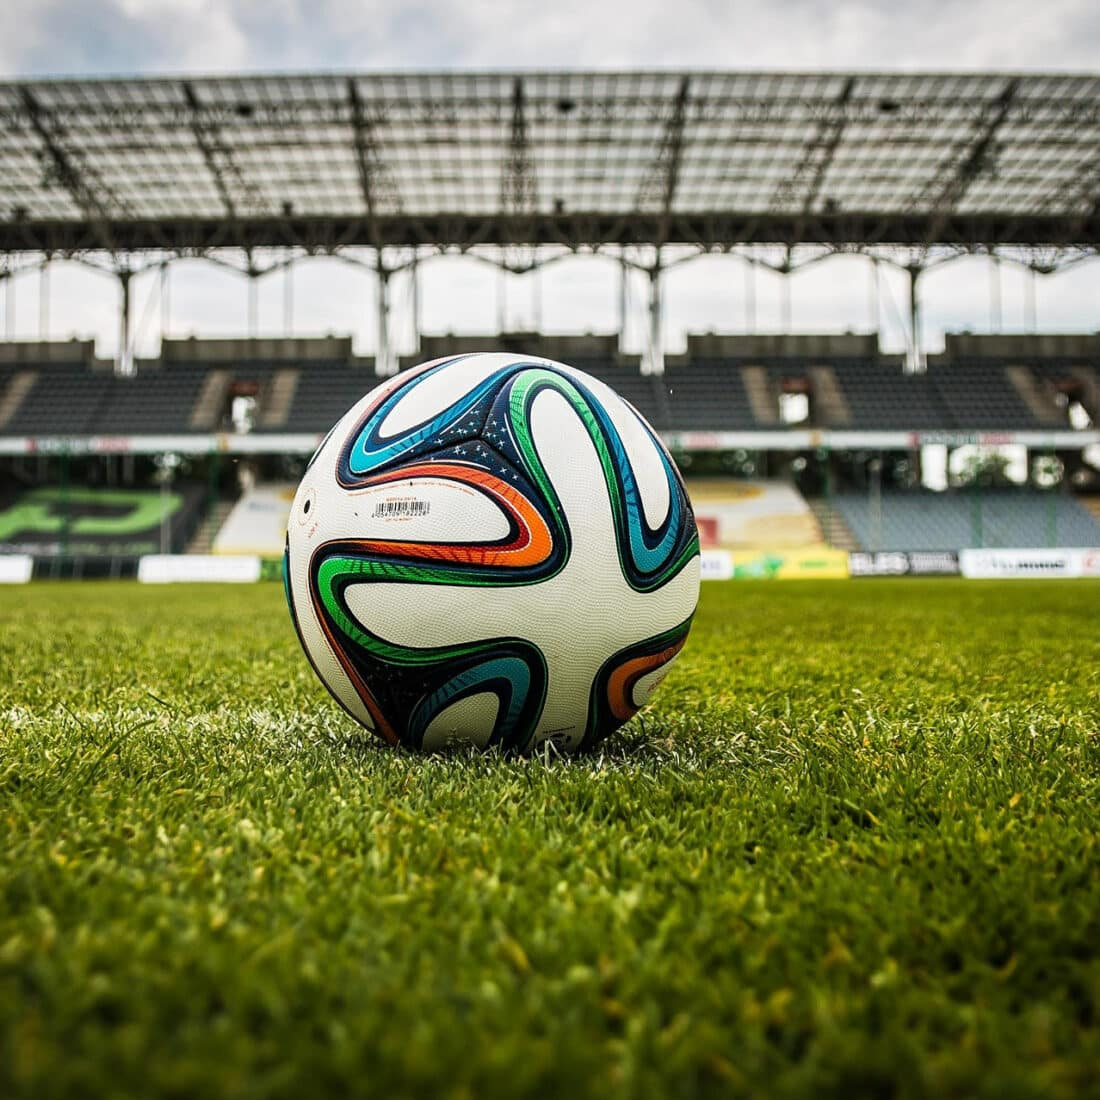 Bundesliga im Ausland sehen - so klappt es